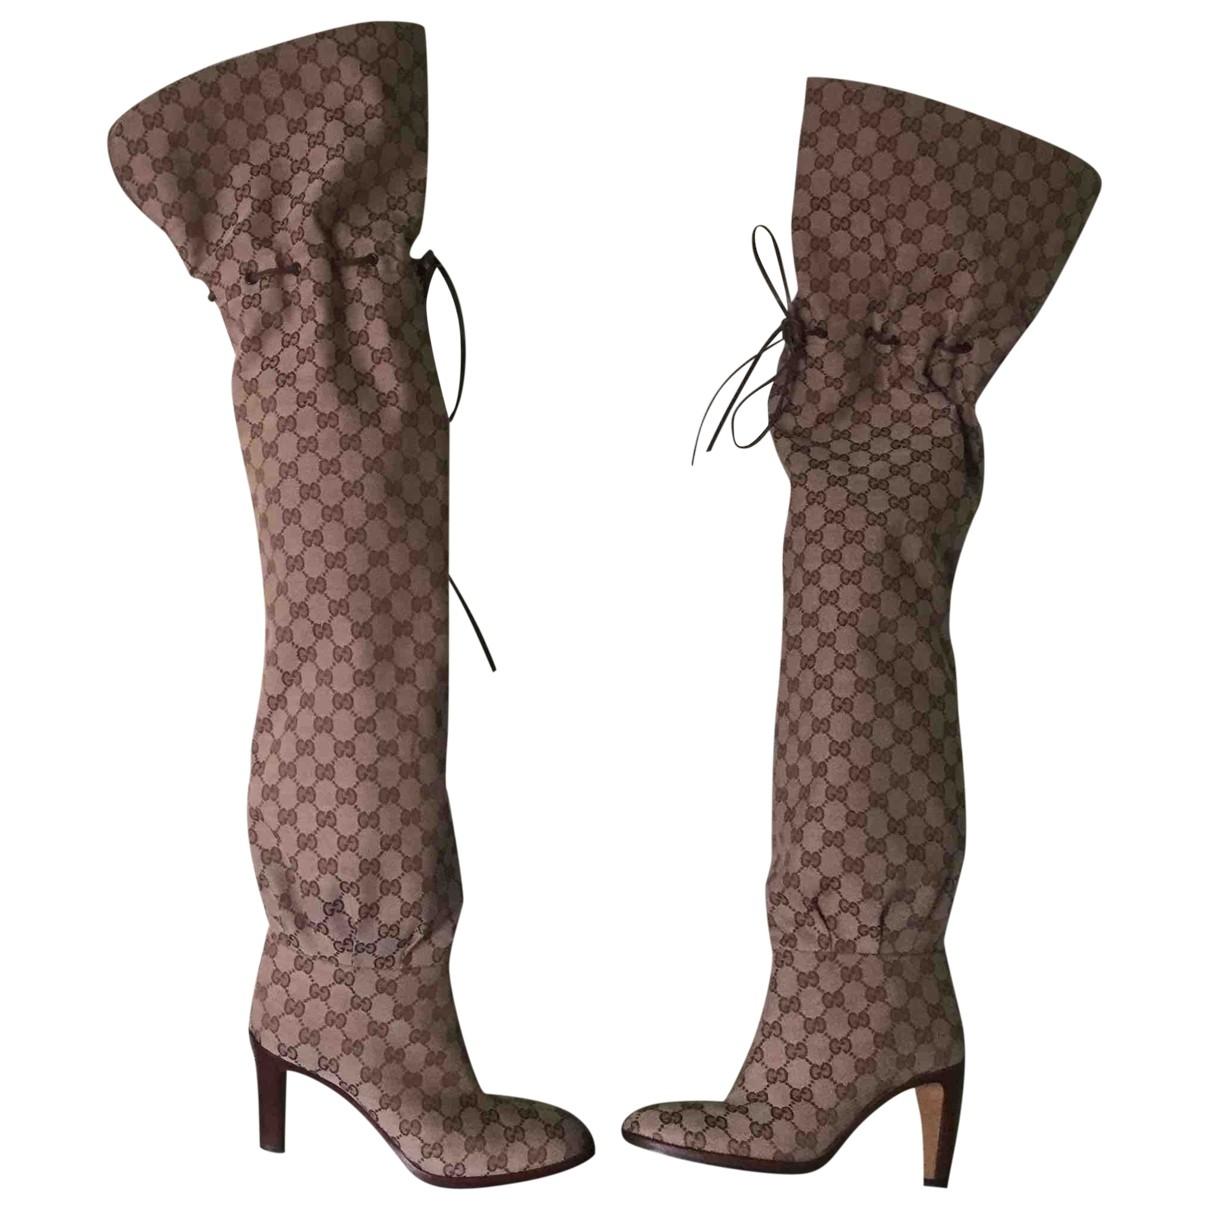 Gucci \N Beige Cloth Boots for Women 39.5 EU